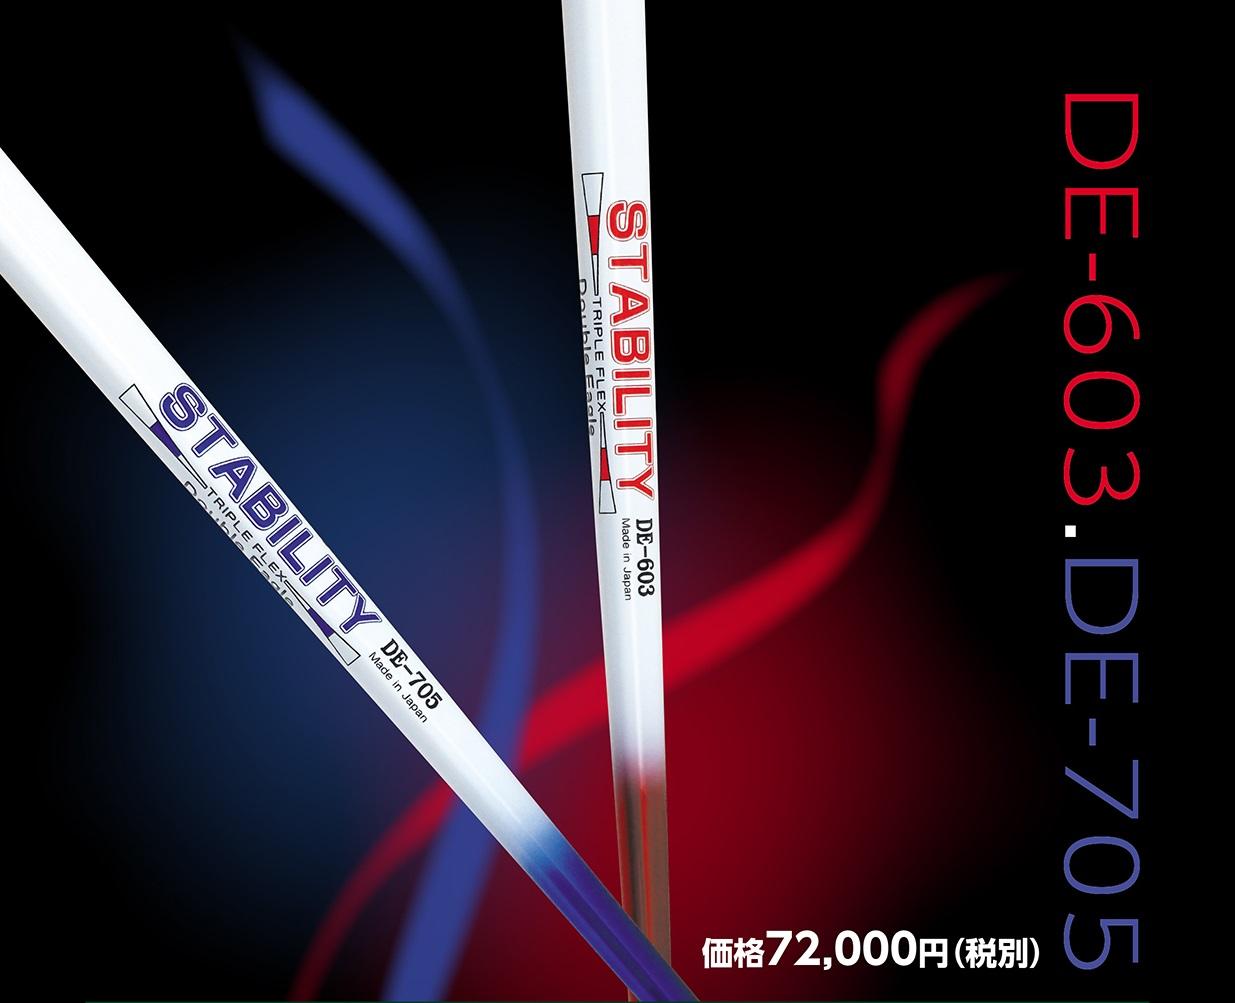 STABILITYシャフト(DE-603&DE-7